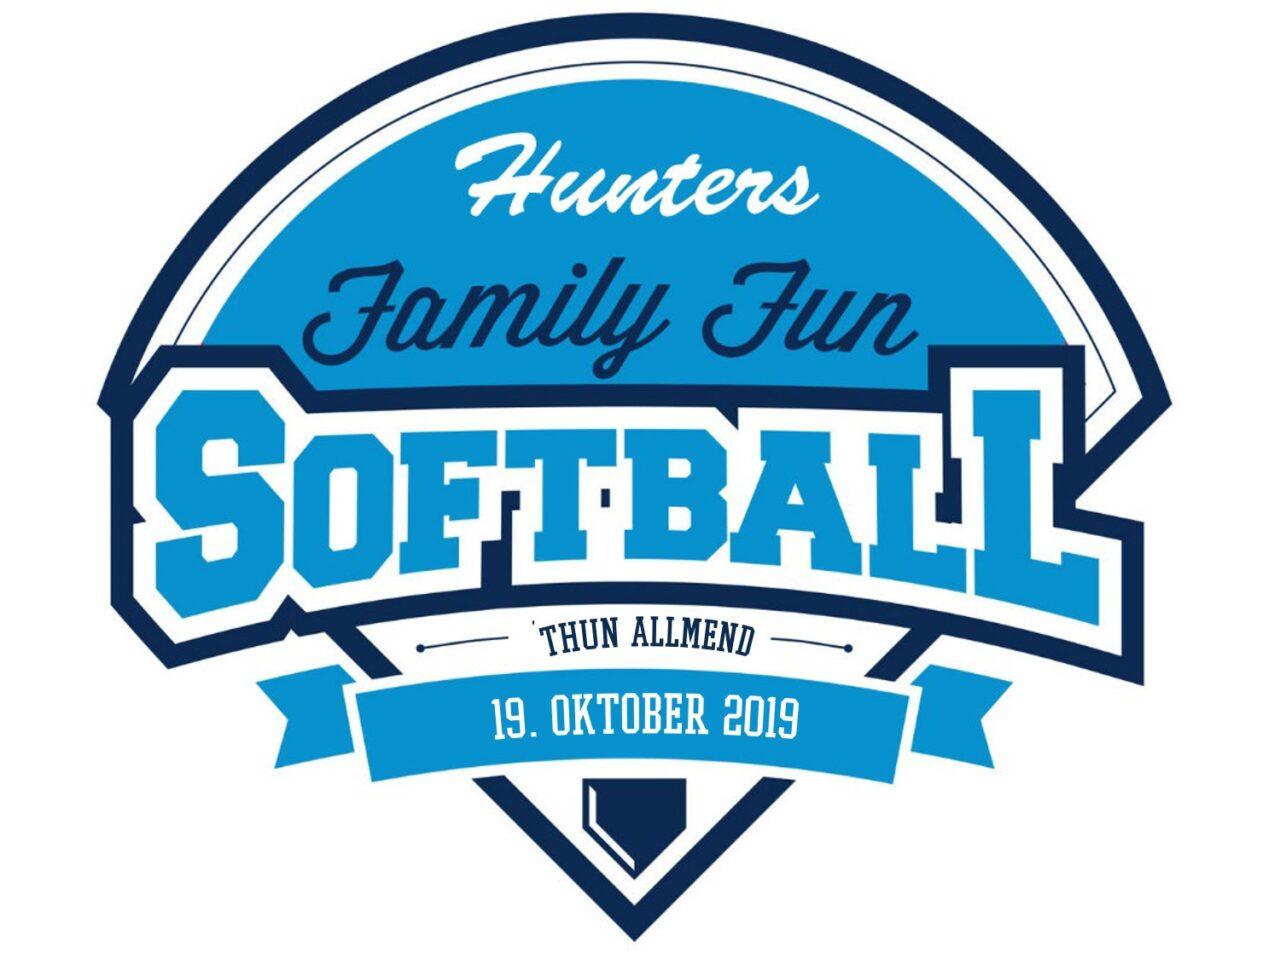 https://www.hunters.ch/wp/wp-content/uploads/2019/09/logo-hunters-softball-2019-1280x960.jpg